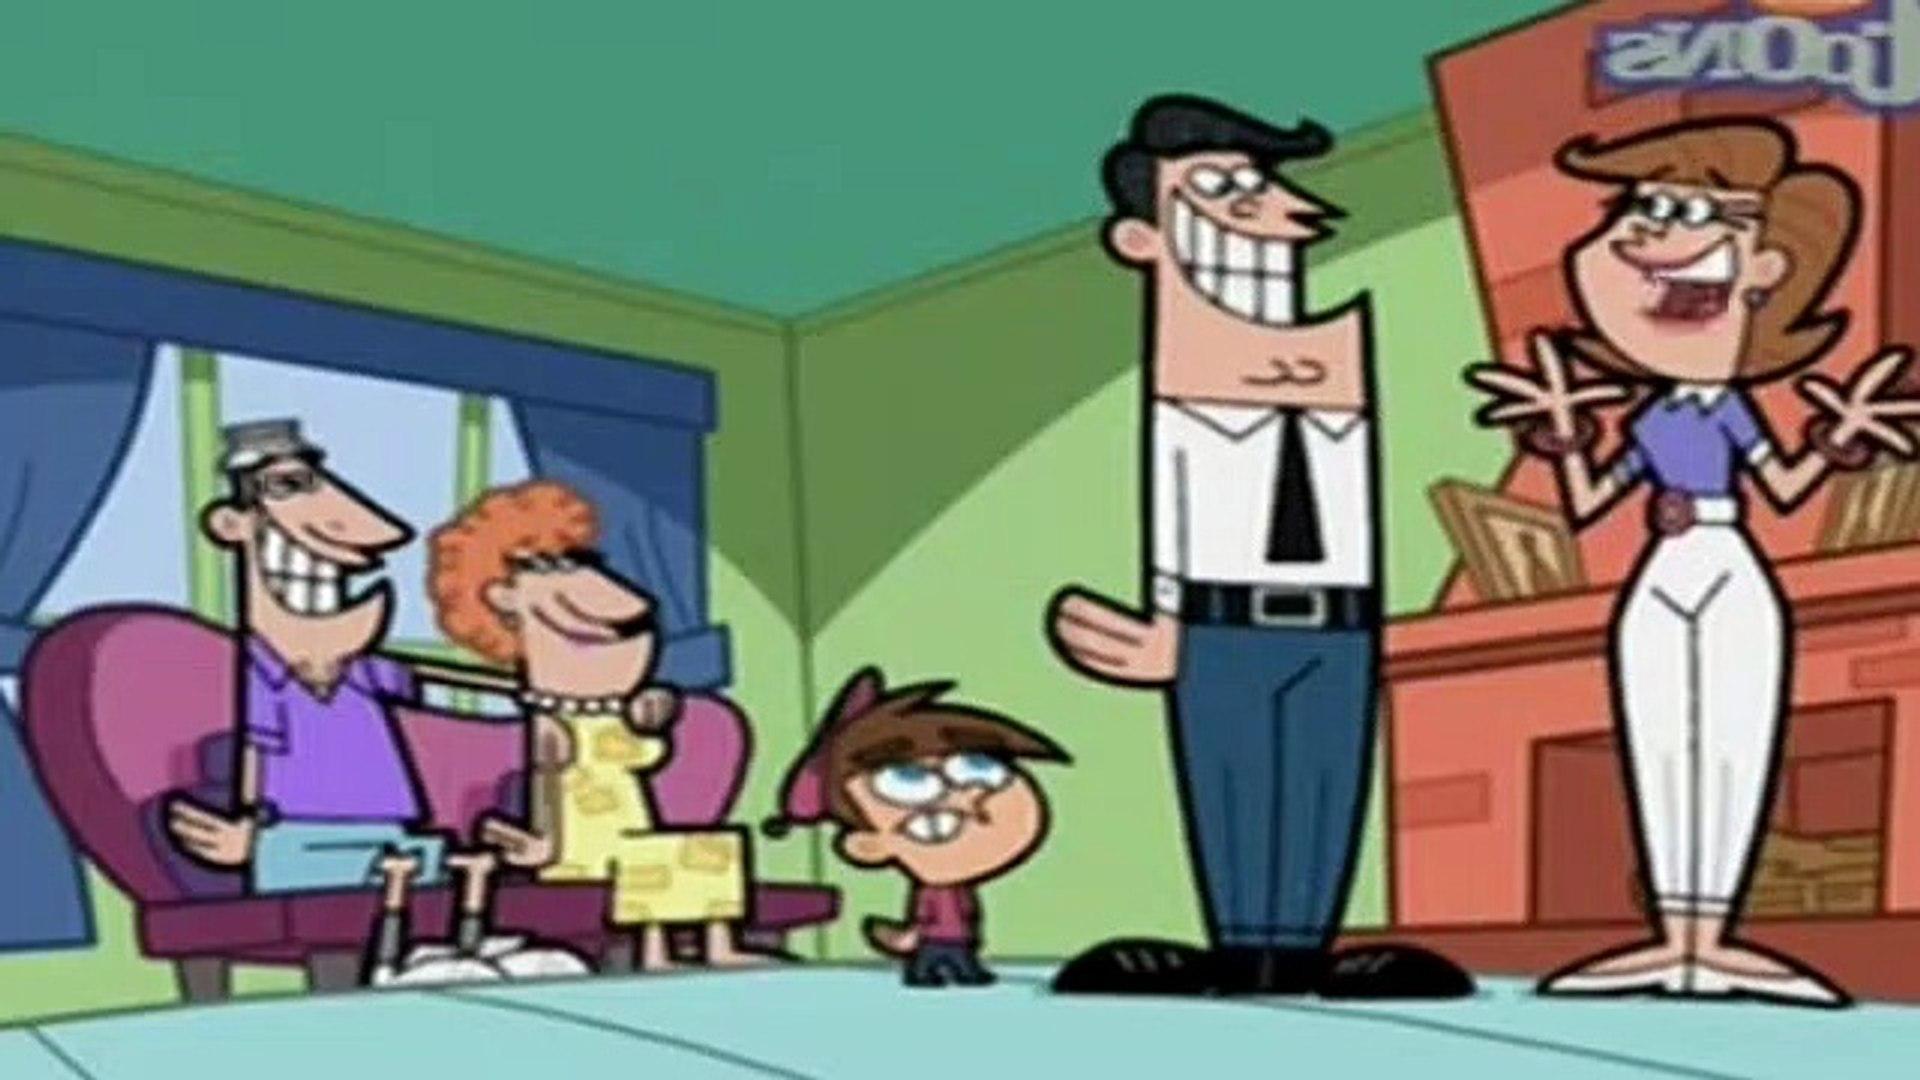 Fairly Odd Parents Photos the fairly oddparents s03e24 - cartoon (#511754) - hd